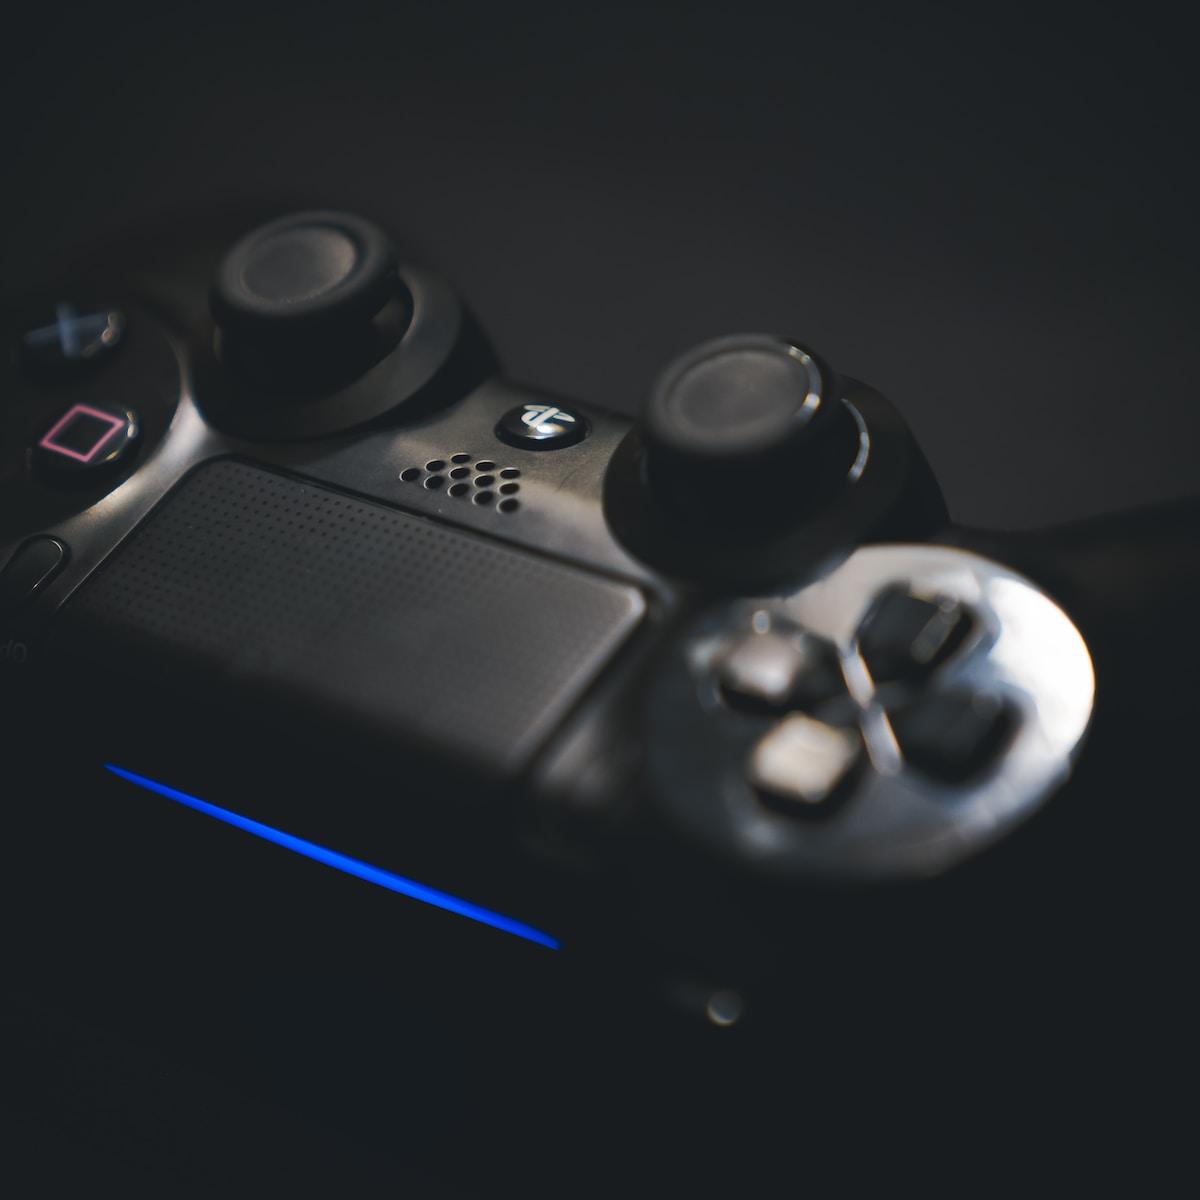 black Playstation game controller